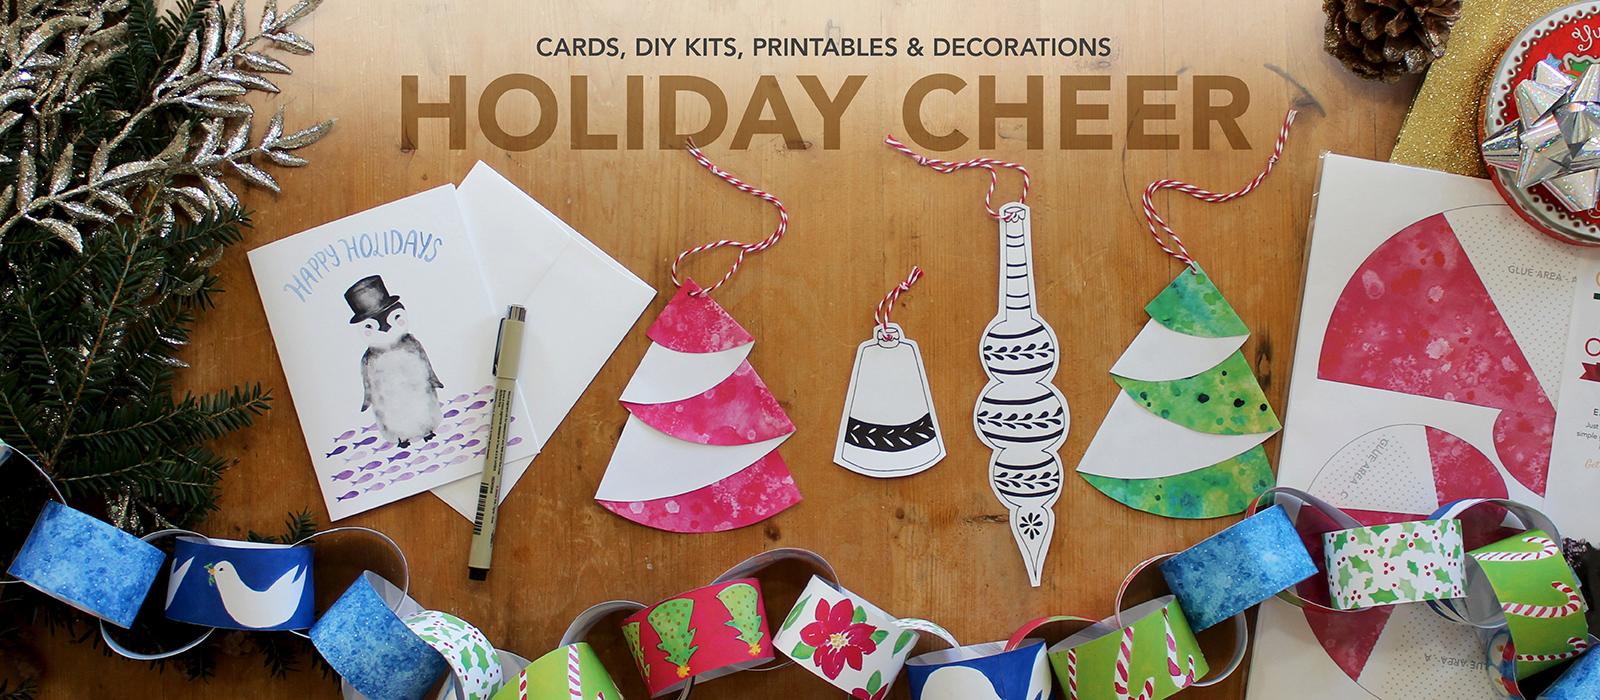 Messy Bed Studio Holiday Cheer Cards, DIY Kits, Printables and Decorations